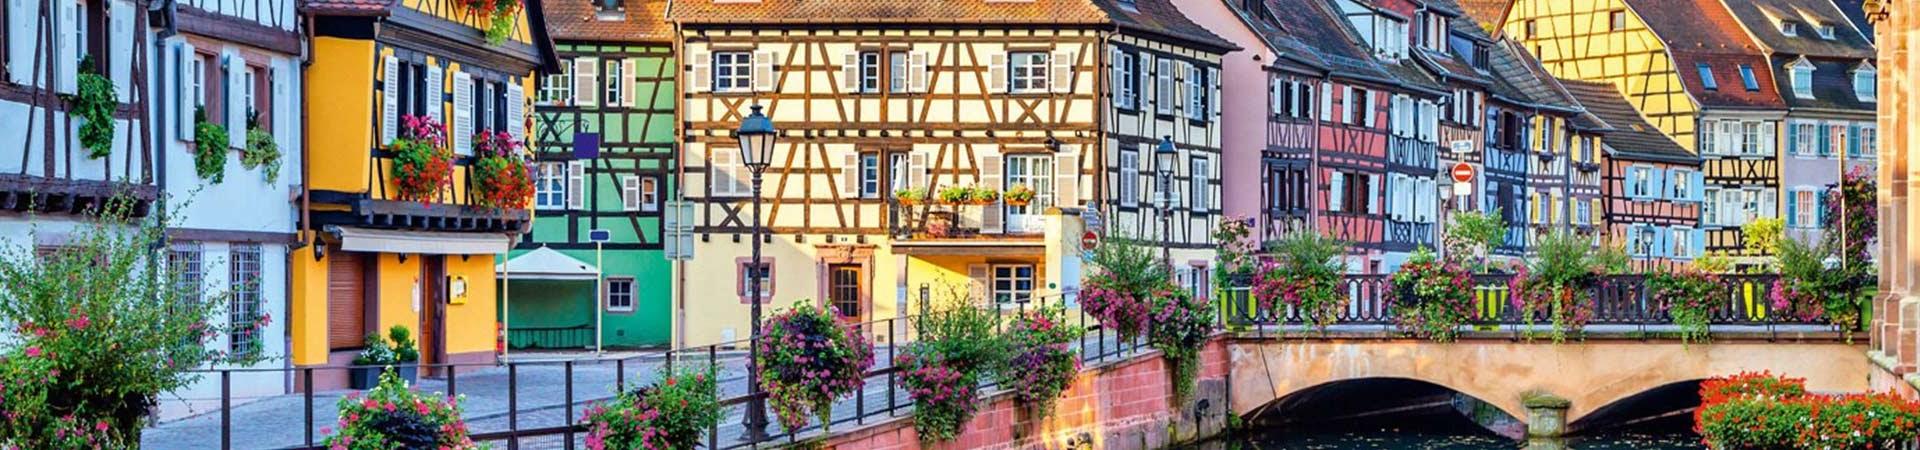 Immobilier Colmar